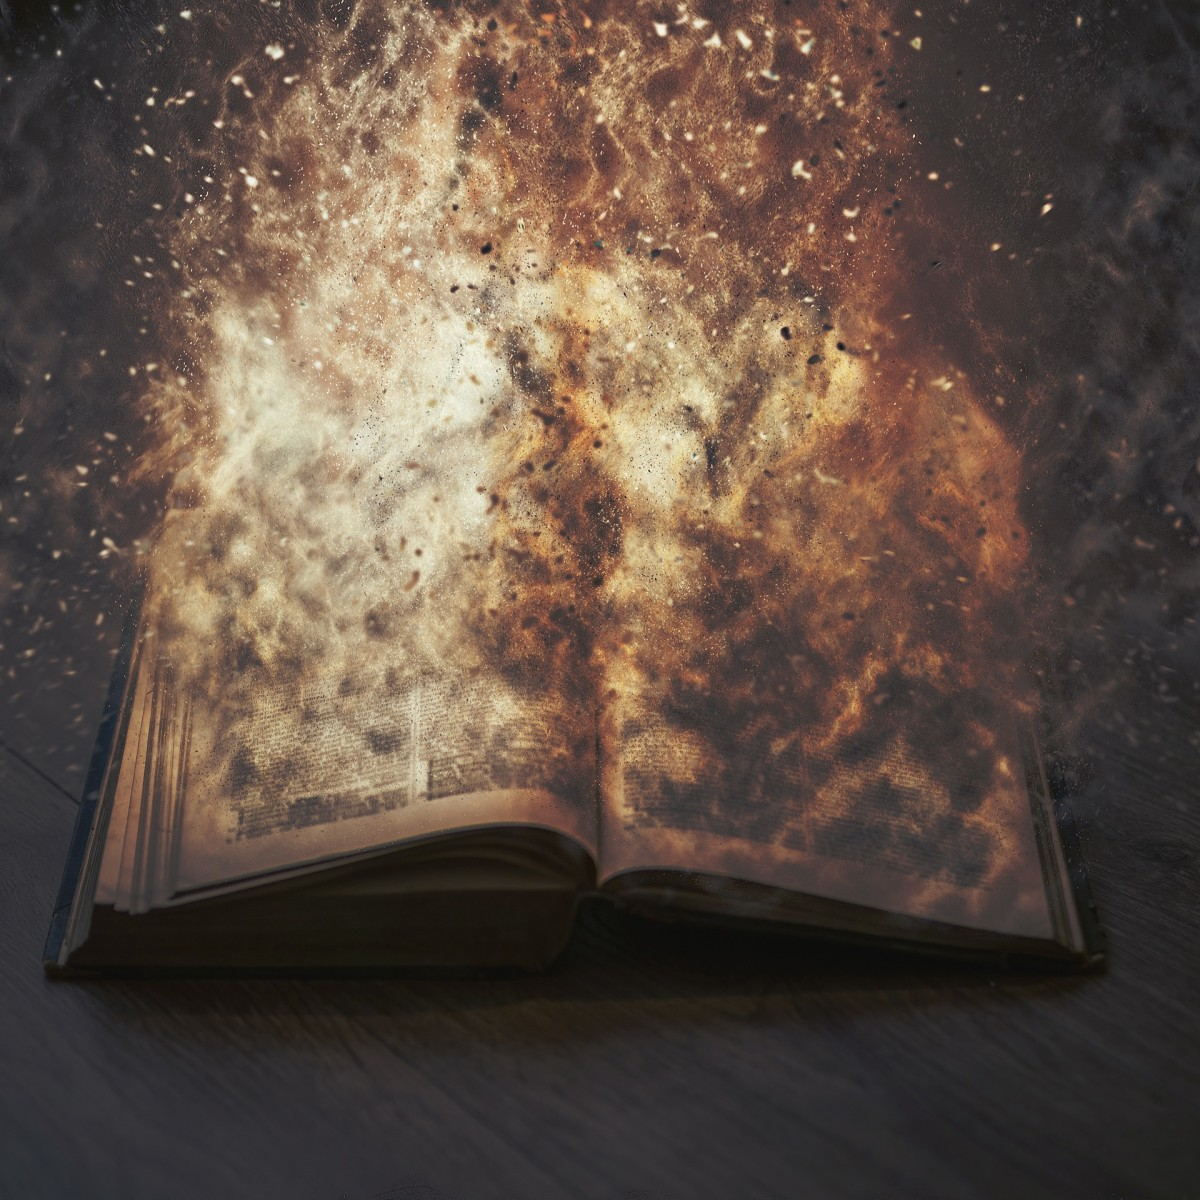 Genre in Literature Defined and Described